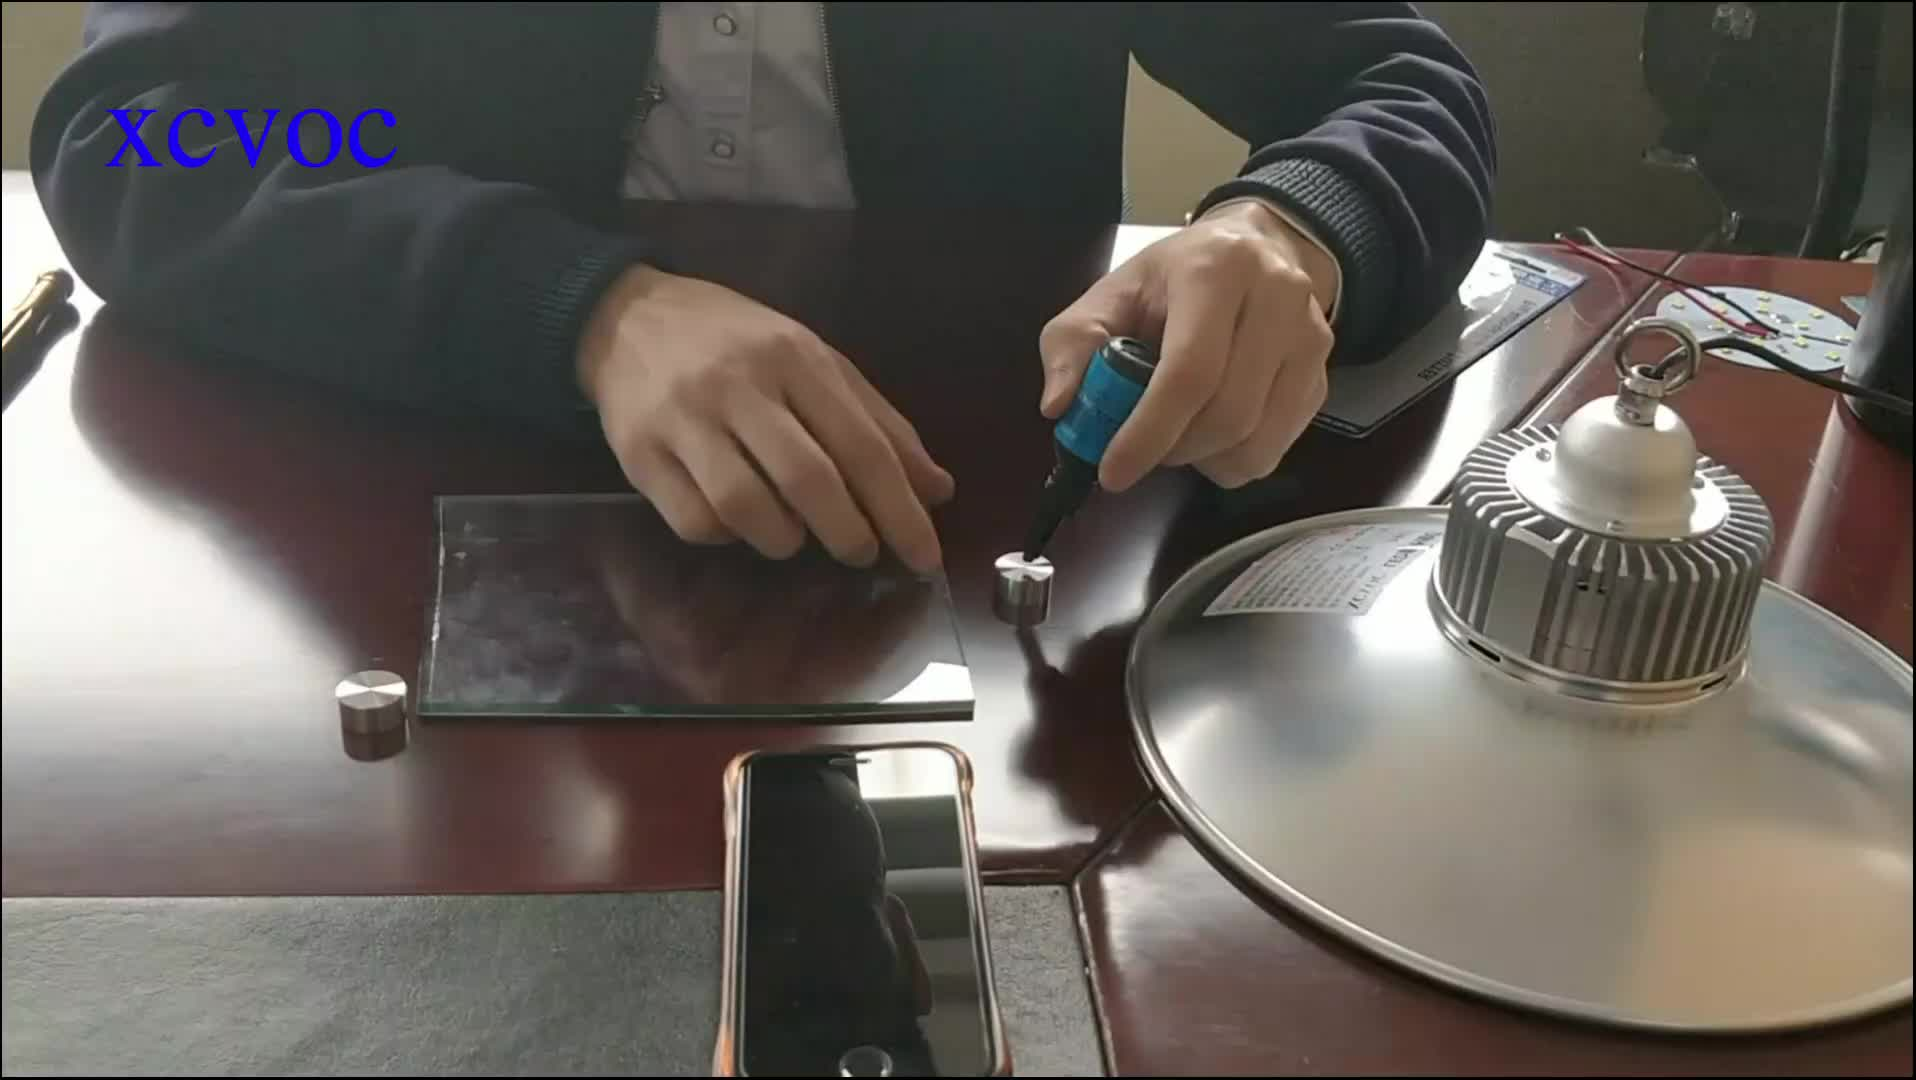 Hoge Kwaliteit UV Lijm voor Glas UV Licht Lijm 3 Tweede Snelle Droge Glas & Metalen UV Cure Adhesive